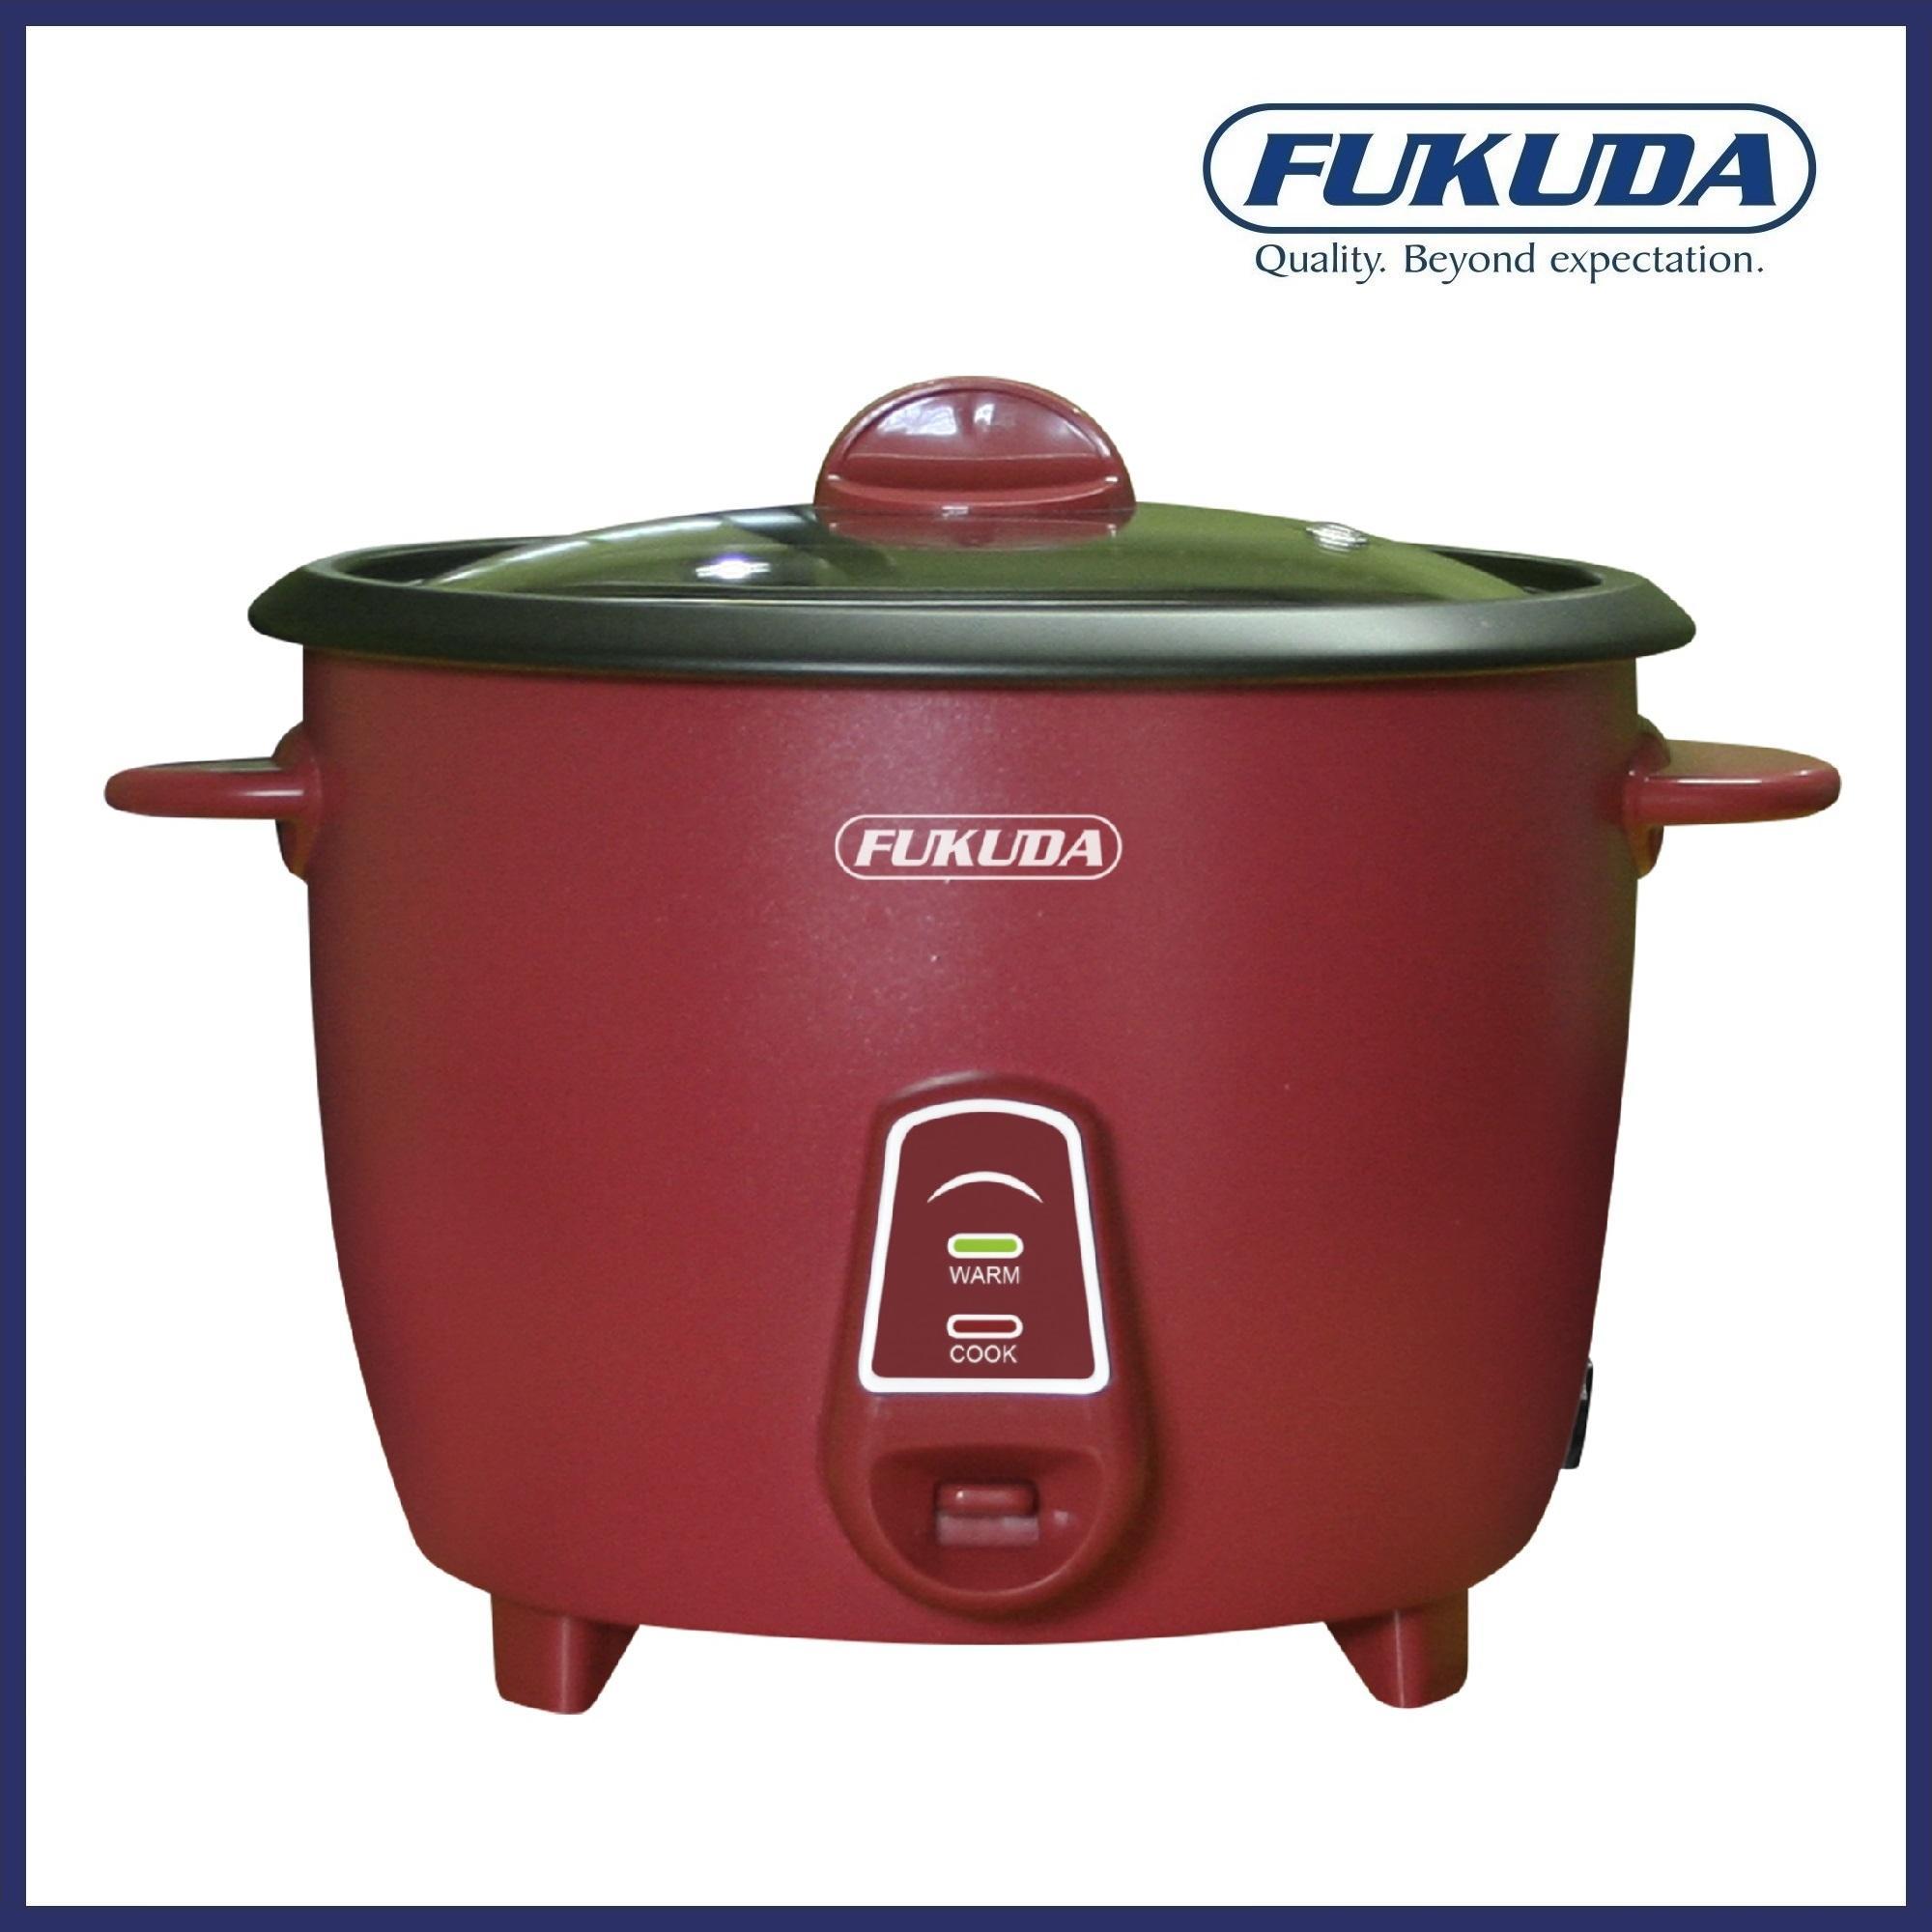 Fukuda FRC815M 8 Cup Matte Finish Drum Type Rice Cooker 1 5L Fuchsia